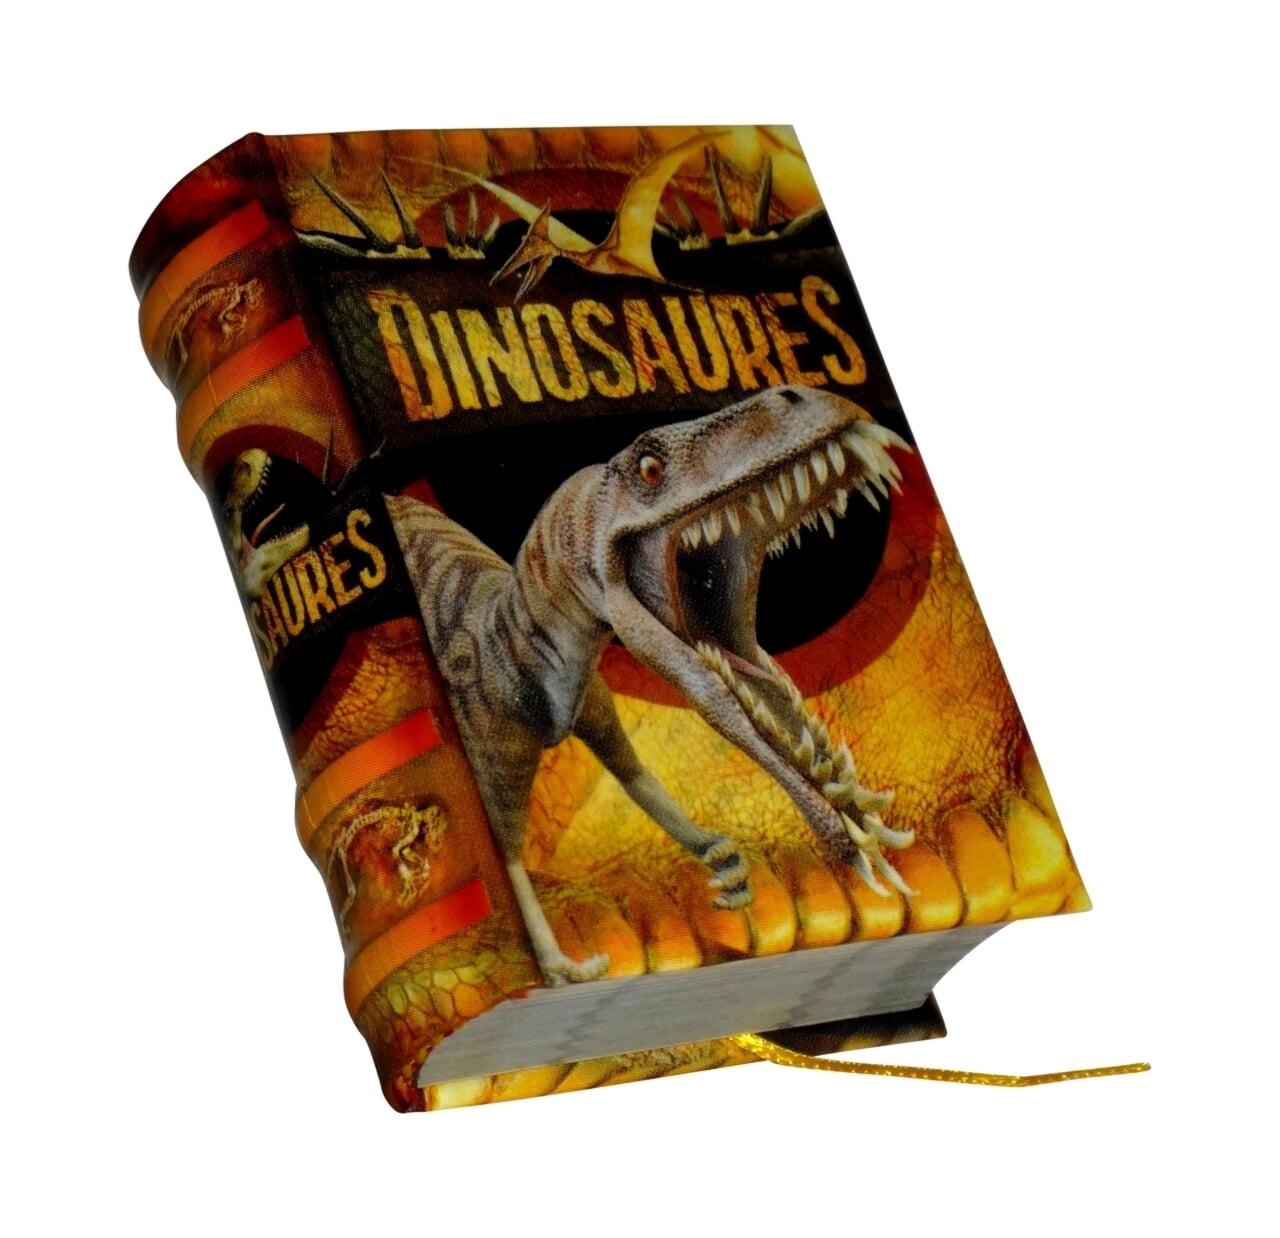 Dinosaures-miniature-book-libro